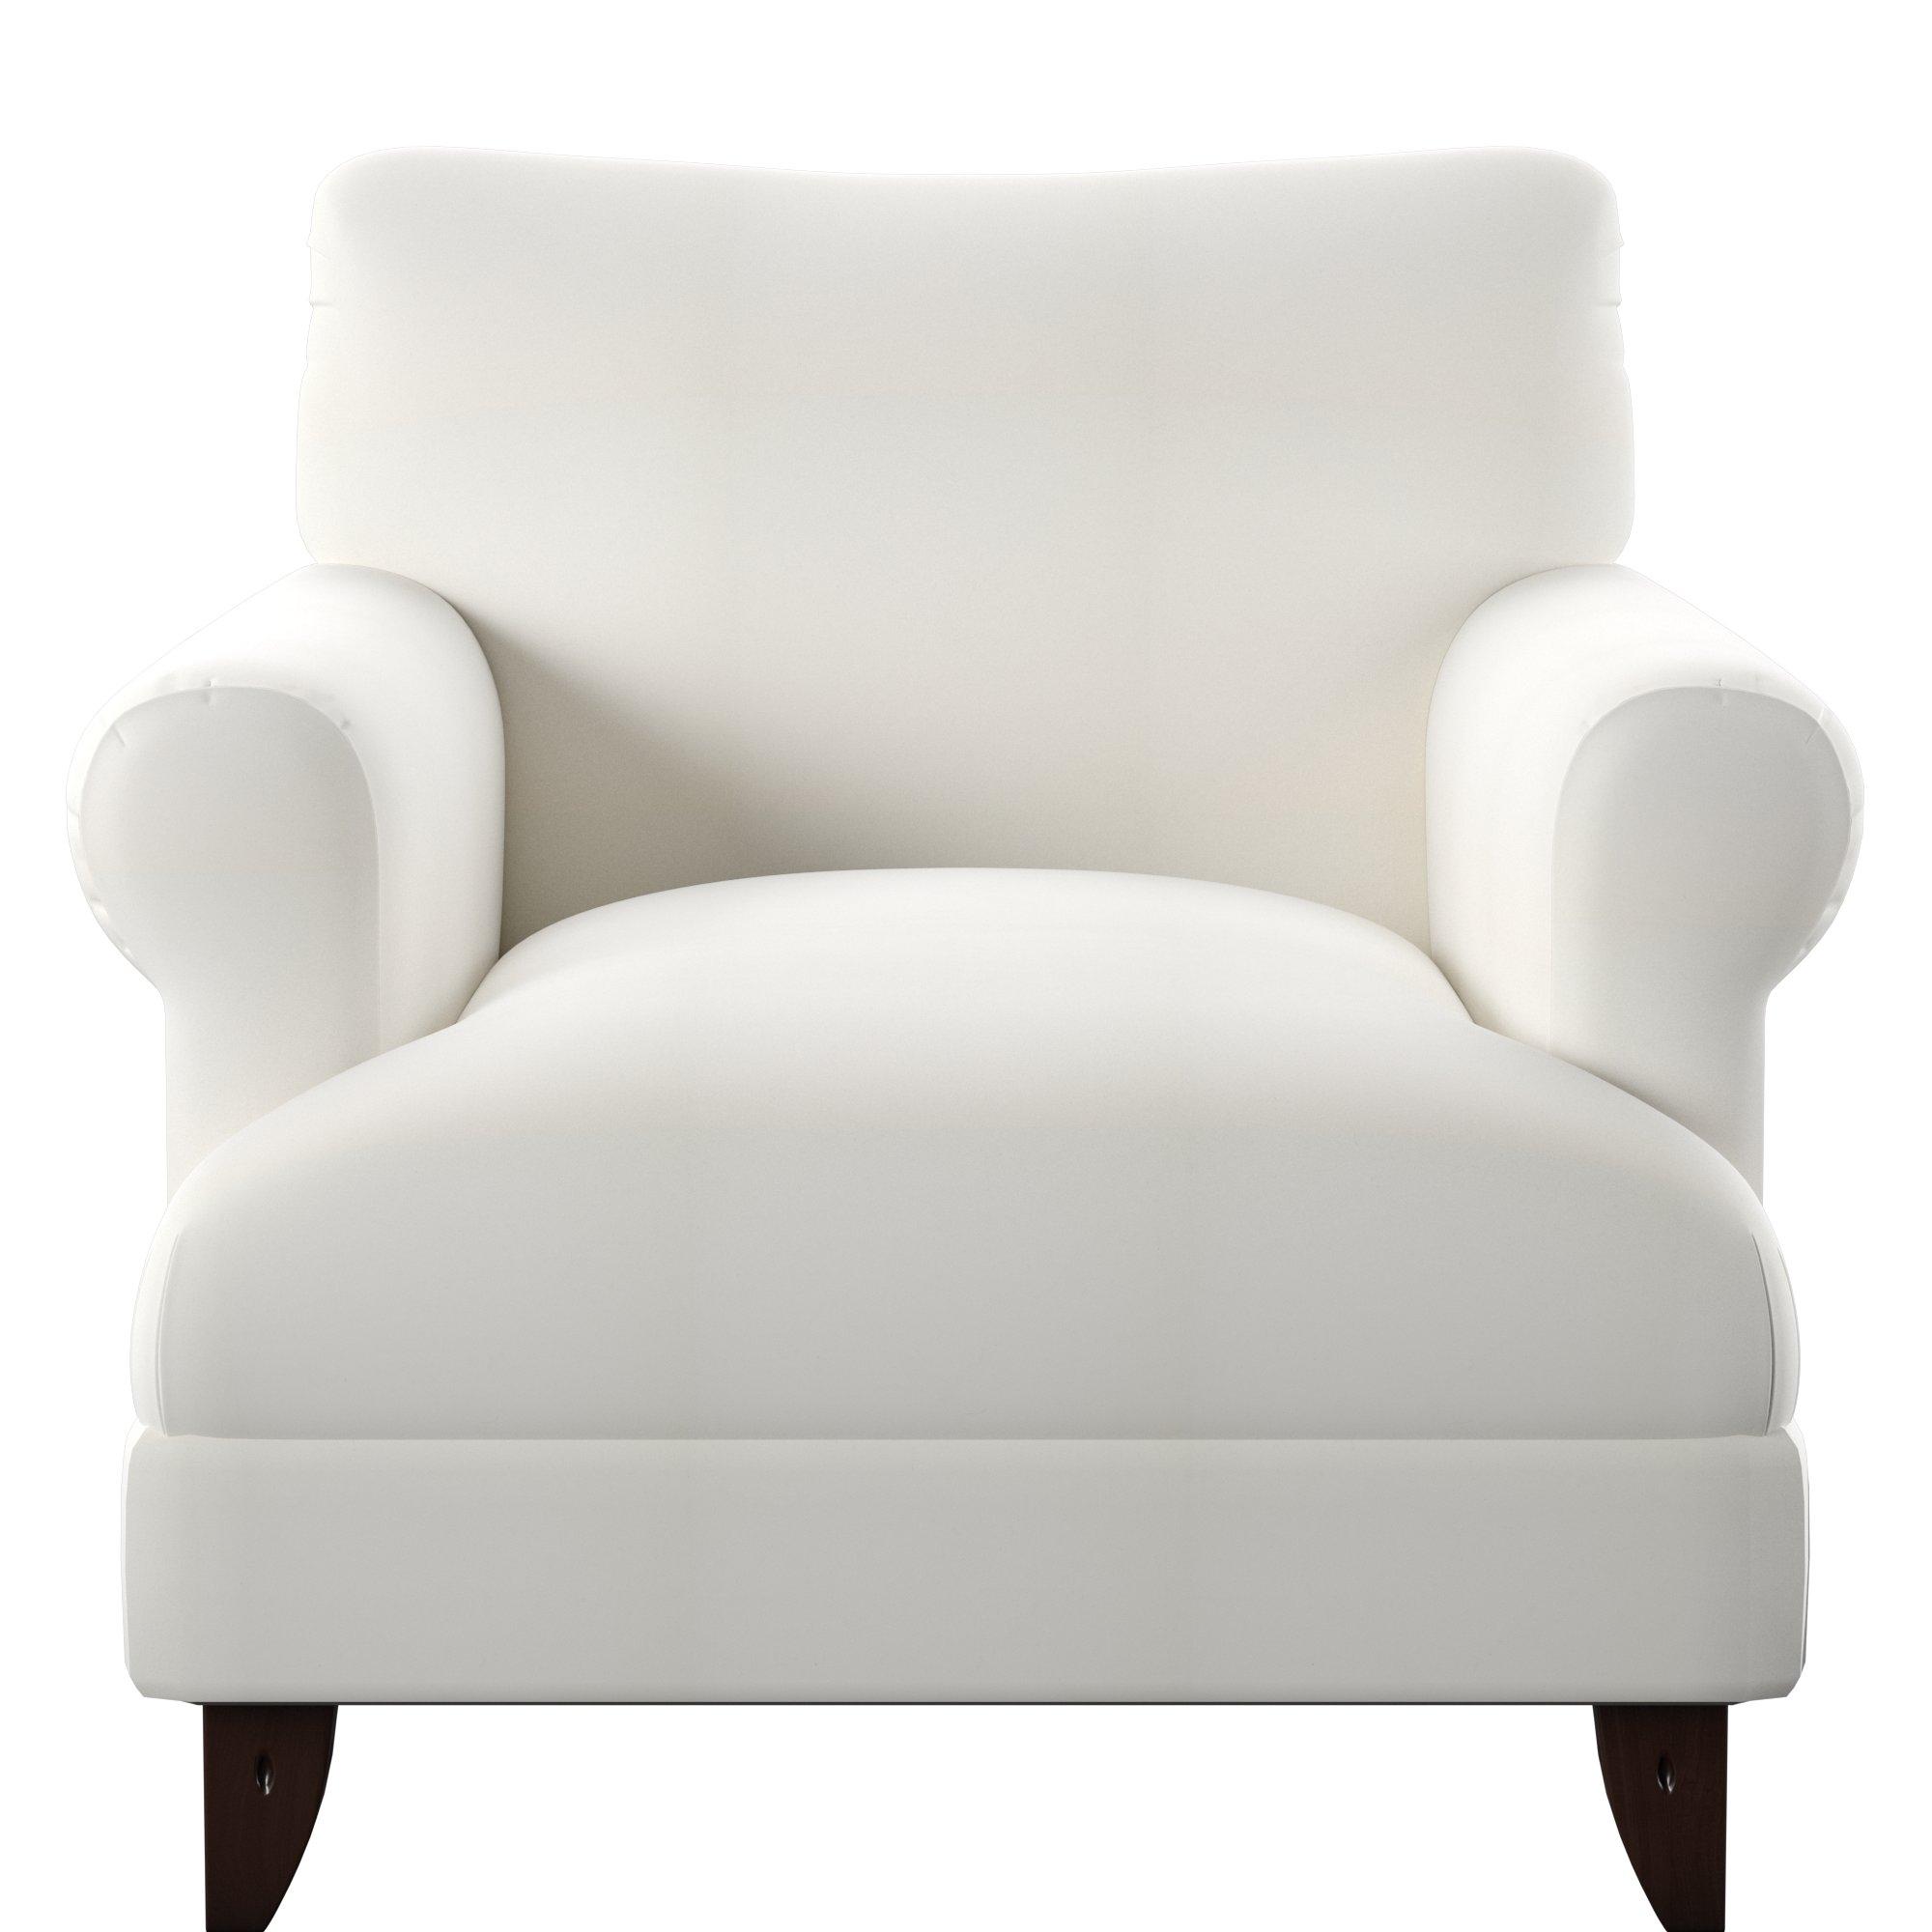 Wayfair Custom Upholstery™ Allie Armchair & Reviews | Wayfair With Allie Dark Grey Sofa Chairs (Image 20 of 20)